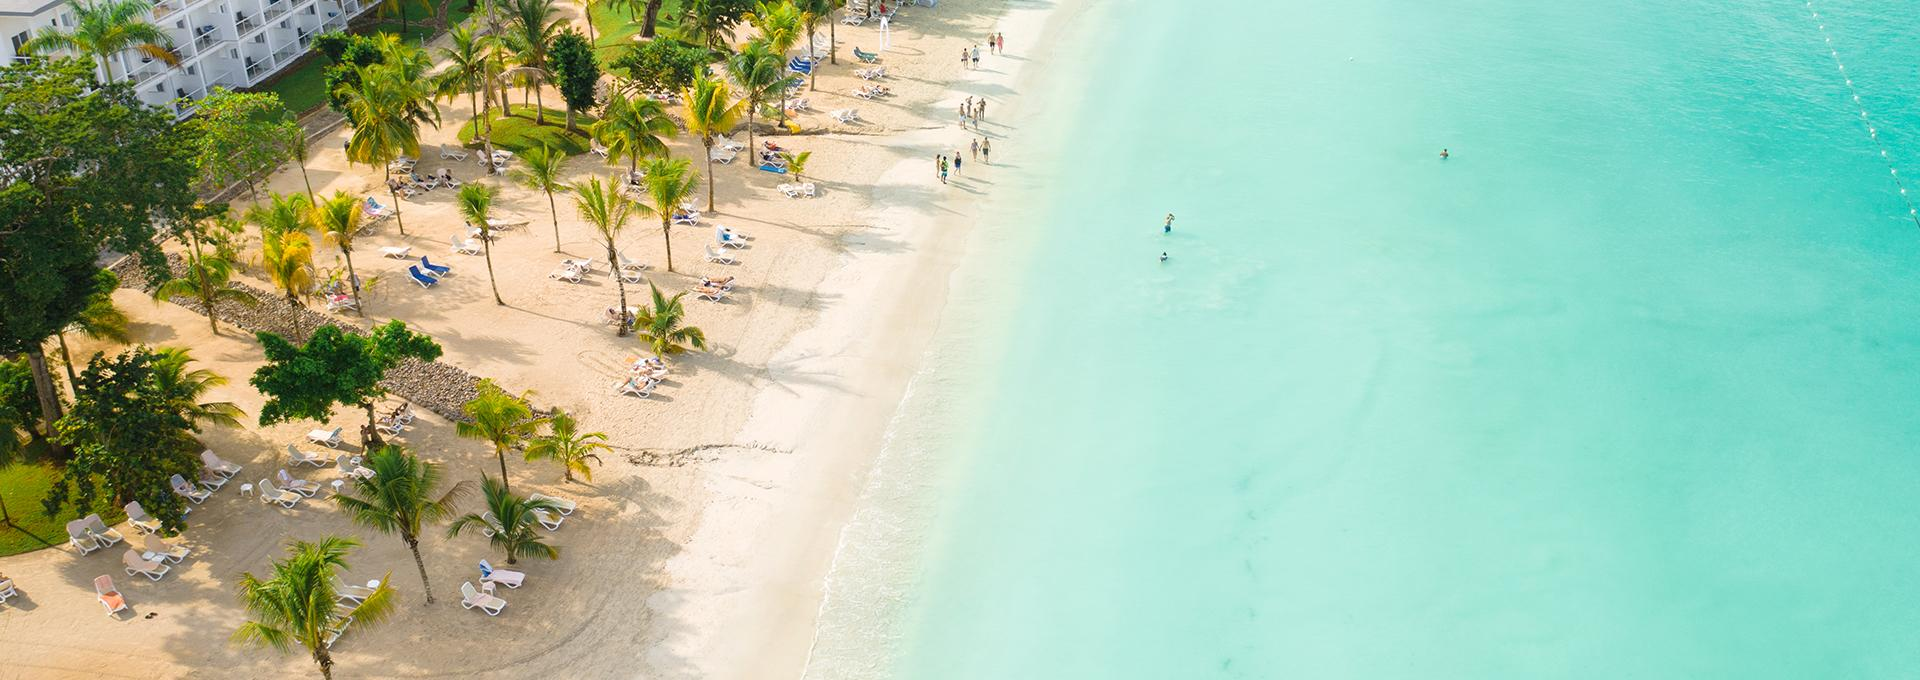 aerial view of the beautiful shoreline of Jamaica